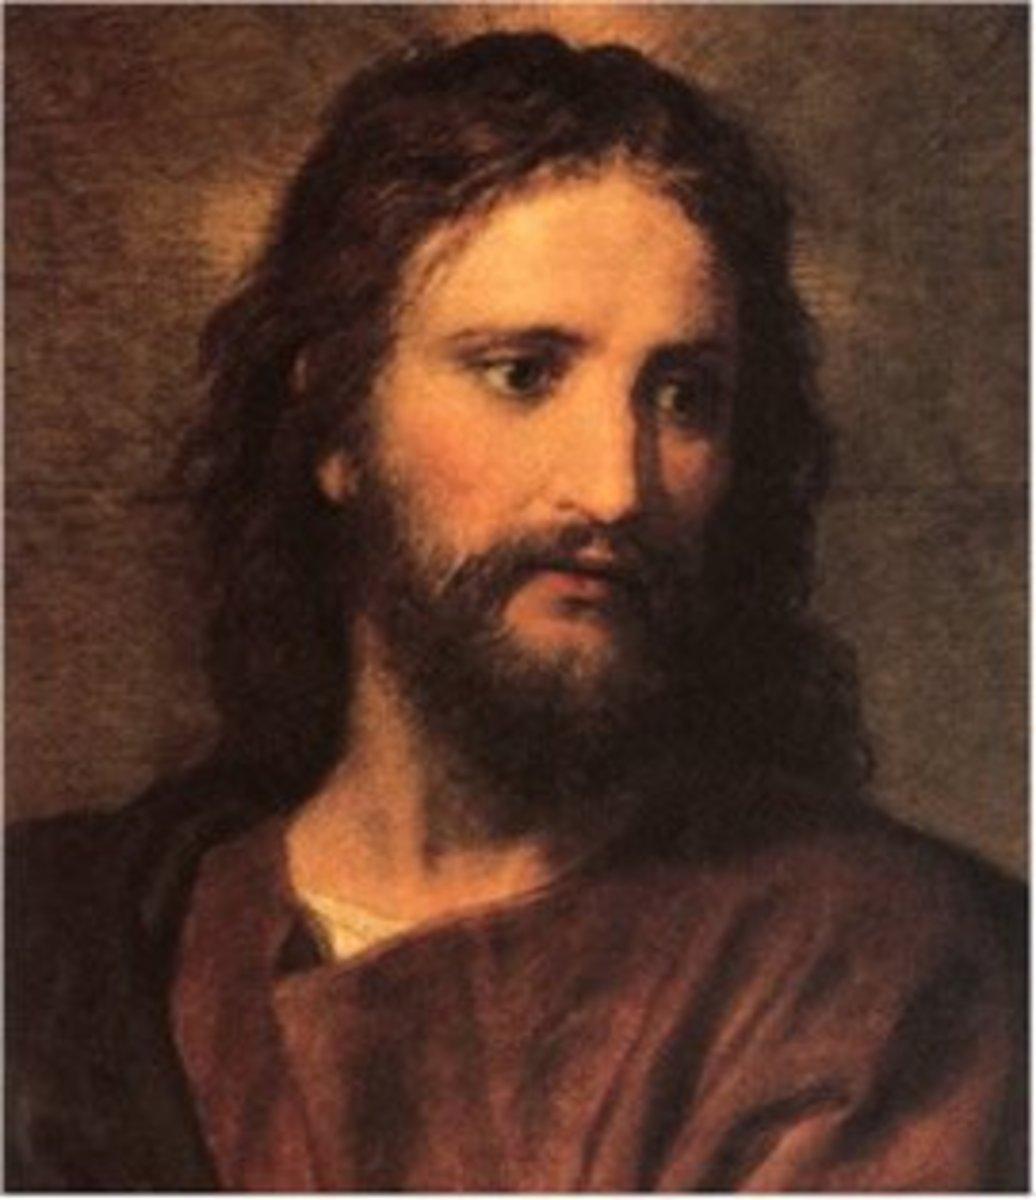 Savior and Redeemer of the world.